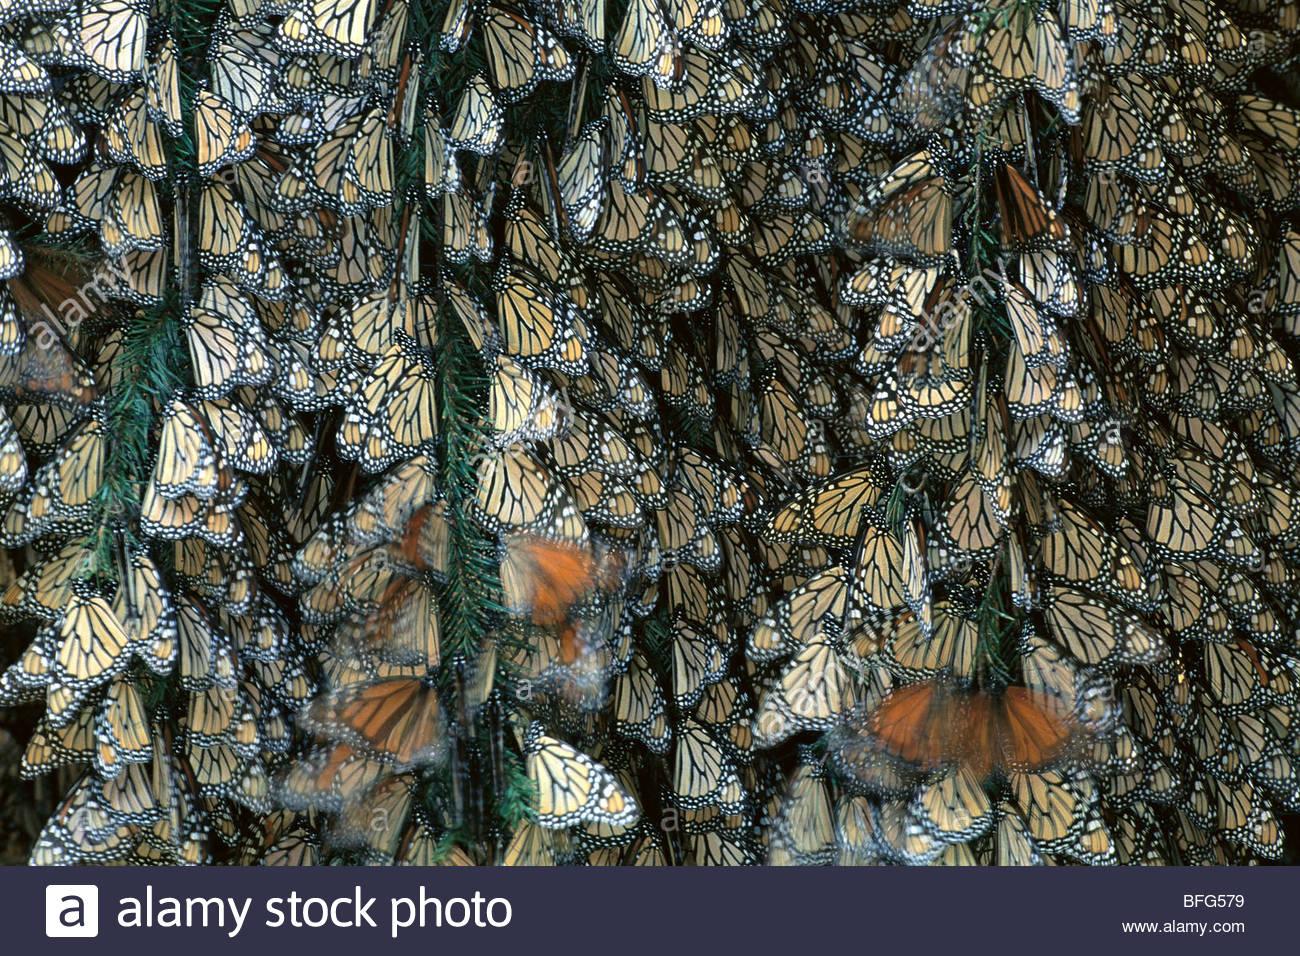 Monarch butterfly colony, Danaus plexippus, Michoacan, Mexico - Stock Image